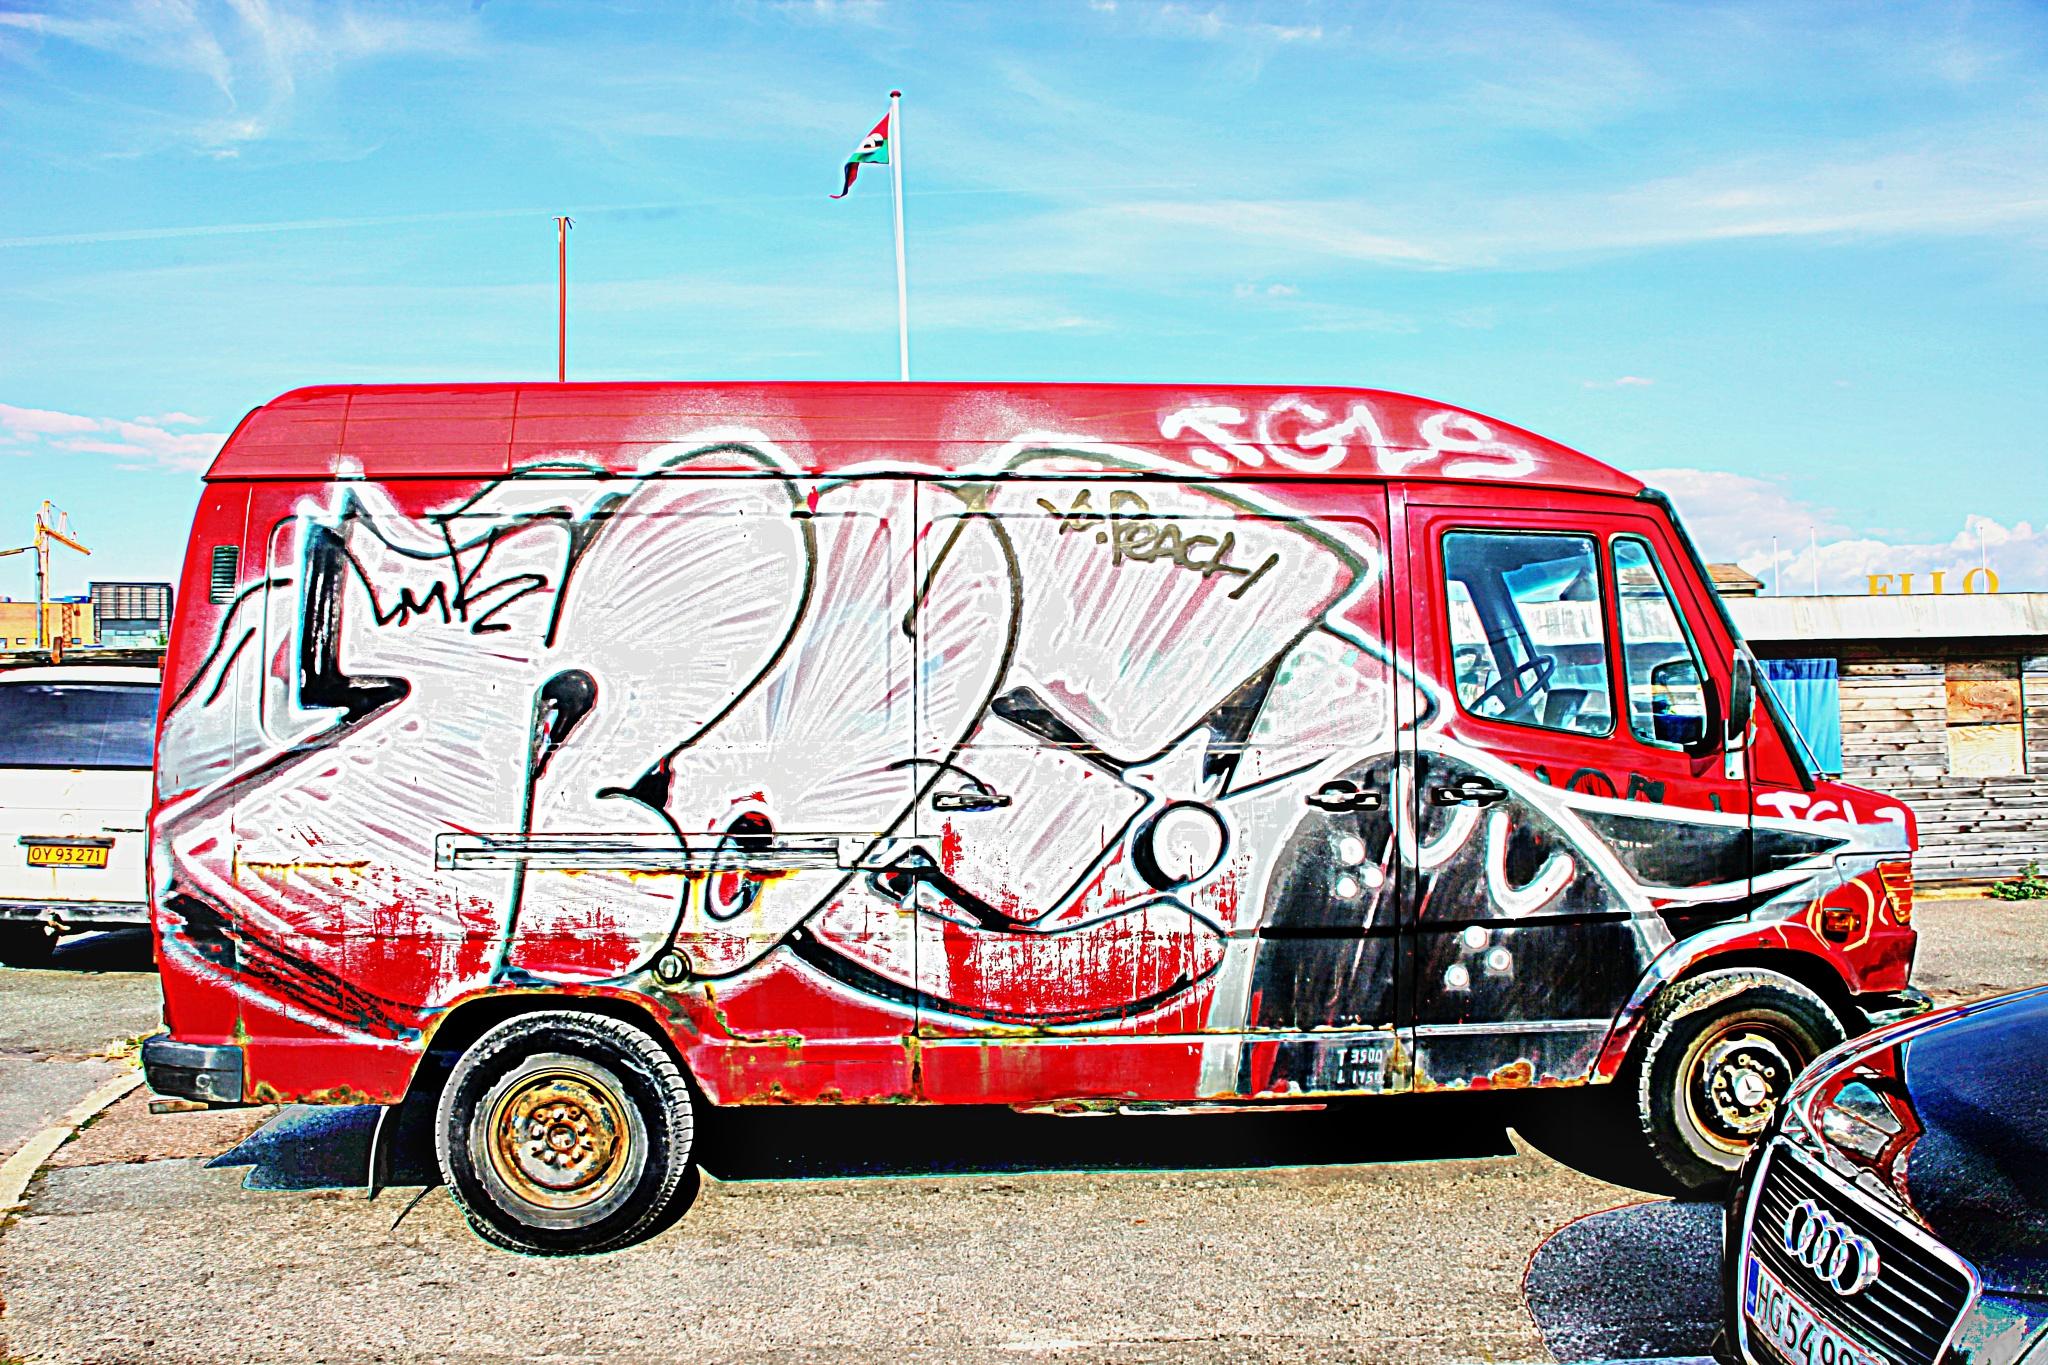 Bus by kulefe31